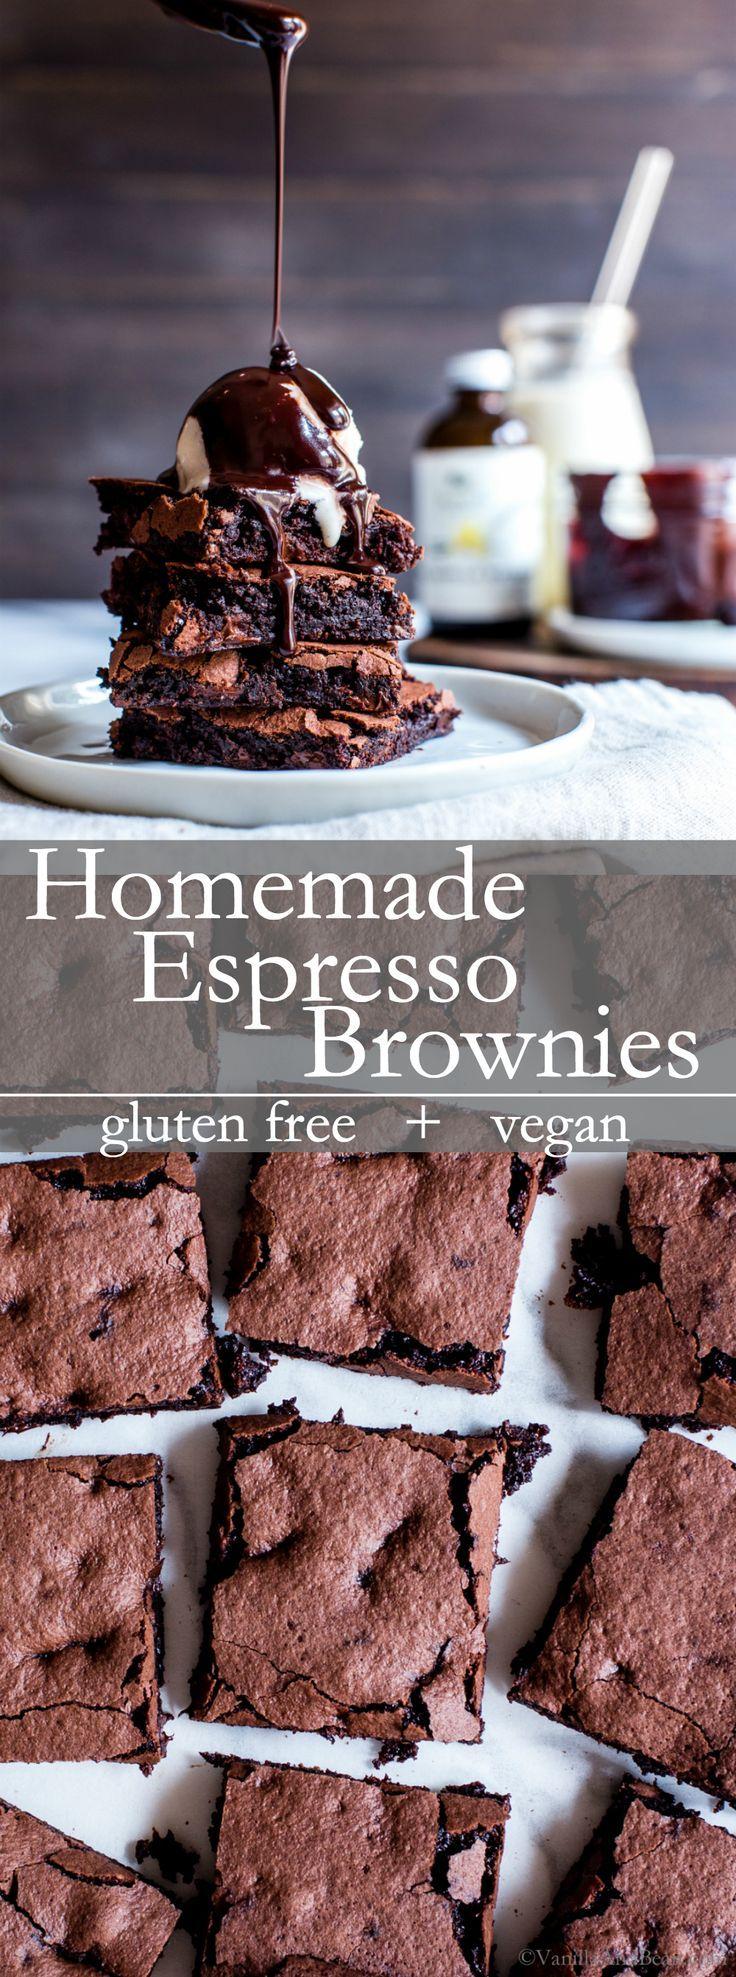 Mini Peach Pie Recipe Vegan Foods Espresso Brownies Brownie